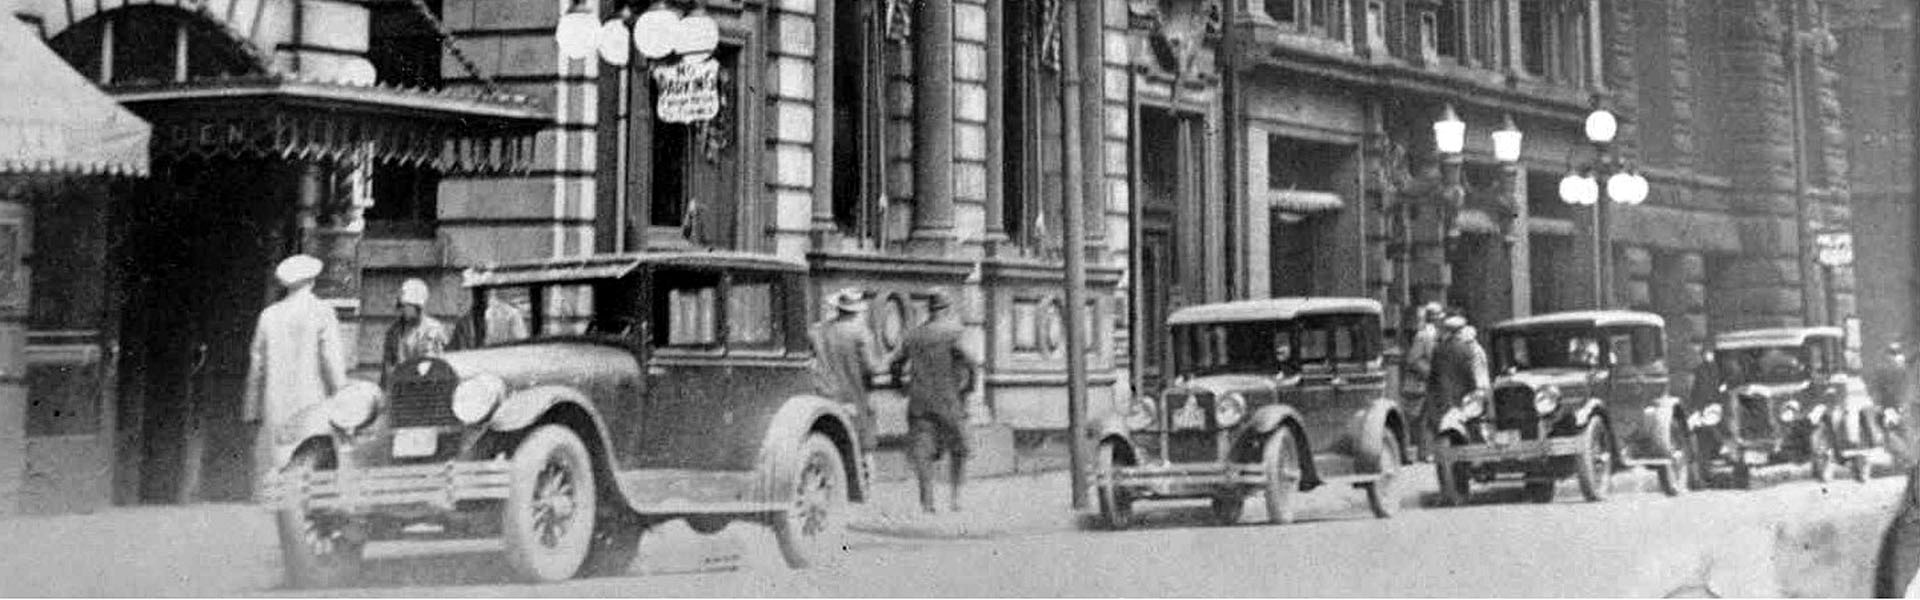 Centre du patrimoine ontarien, Toronto (1927)